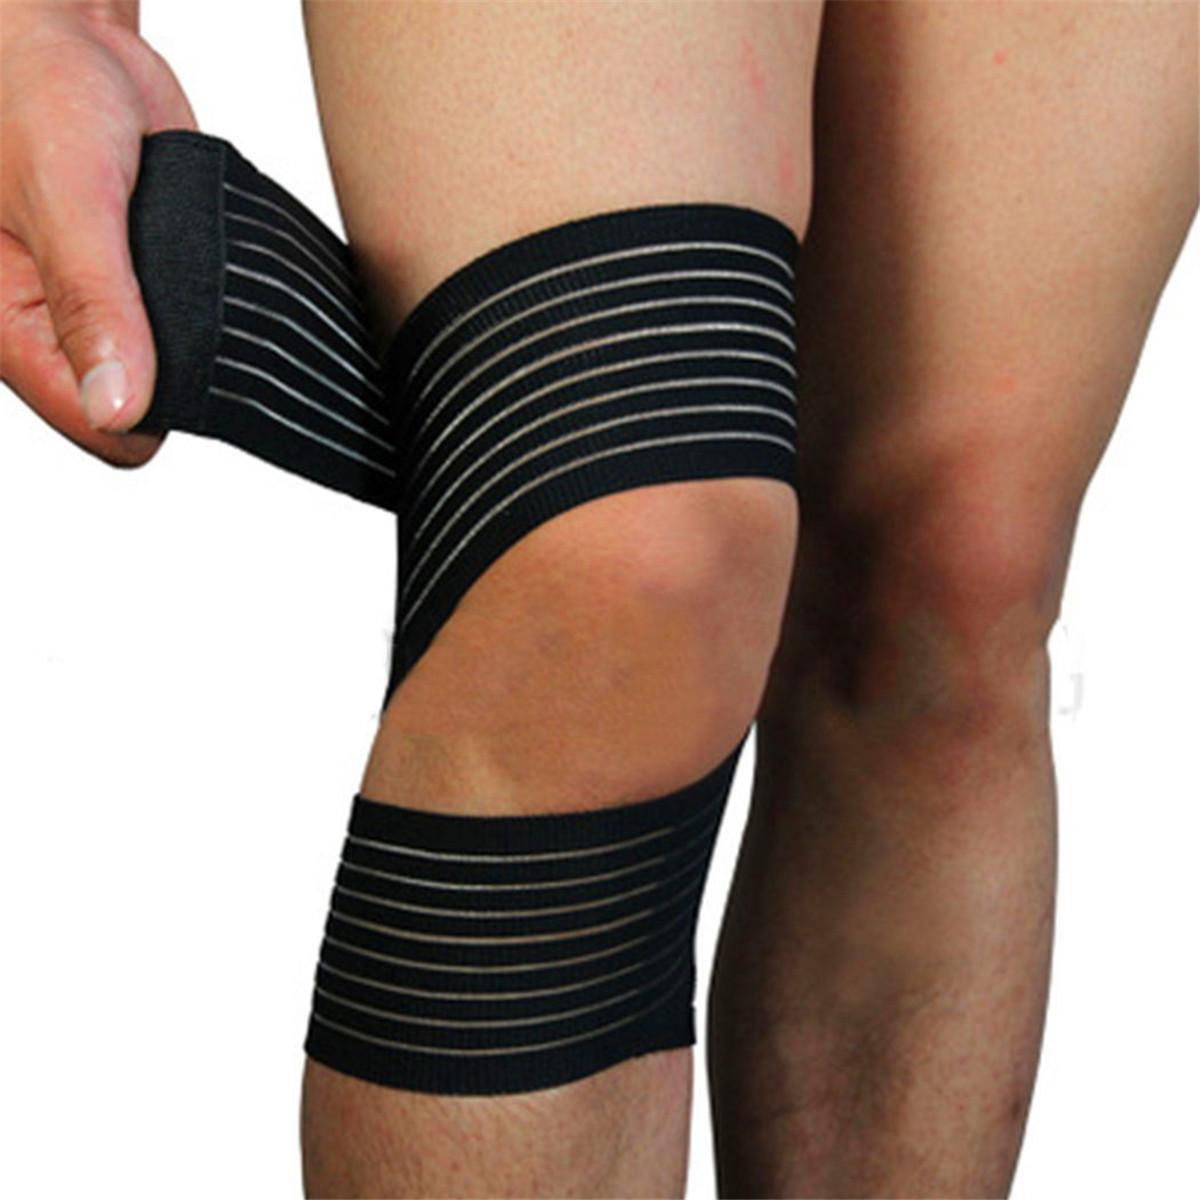 ace bandage knee sprain